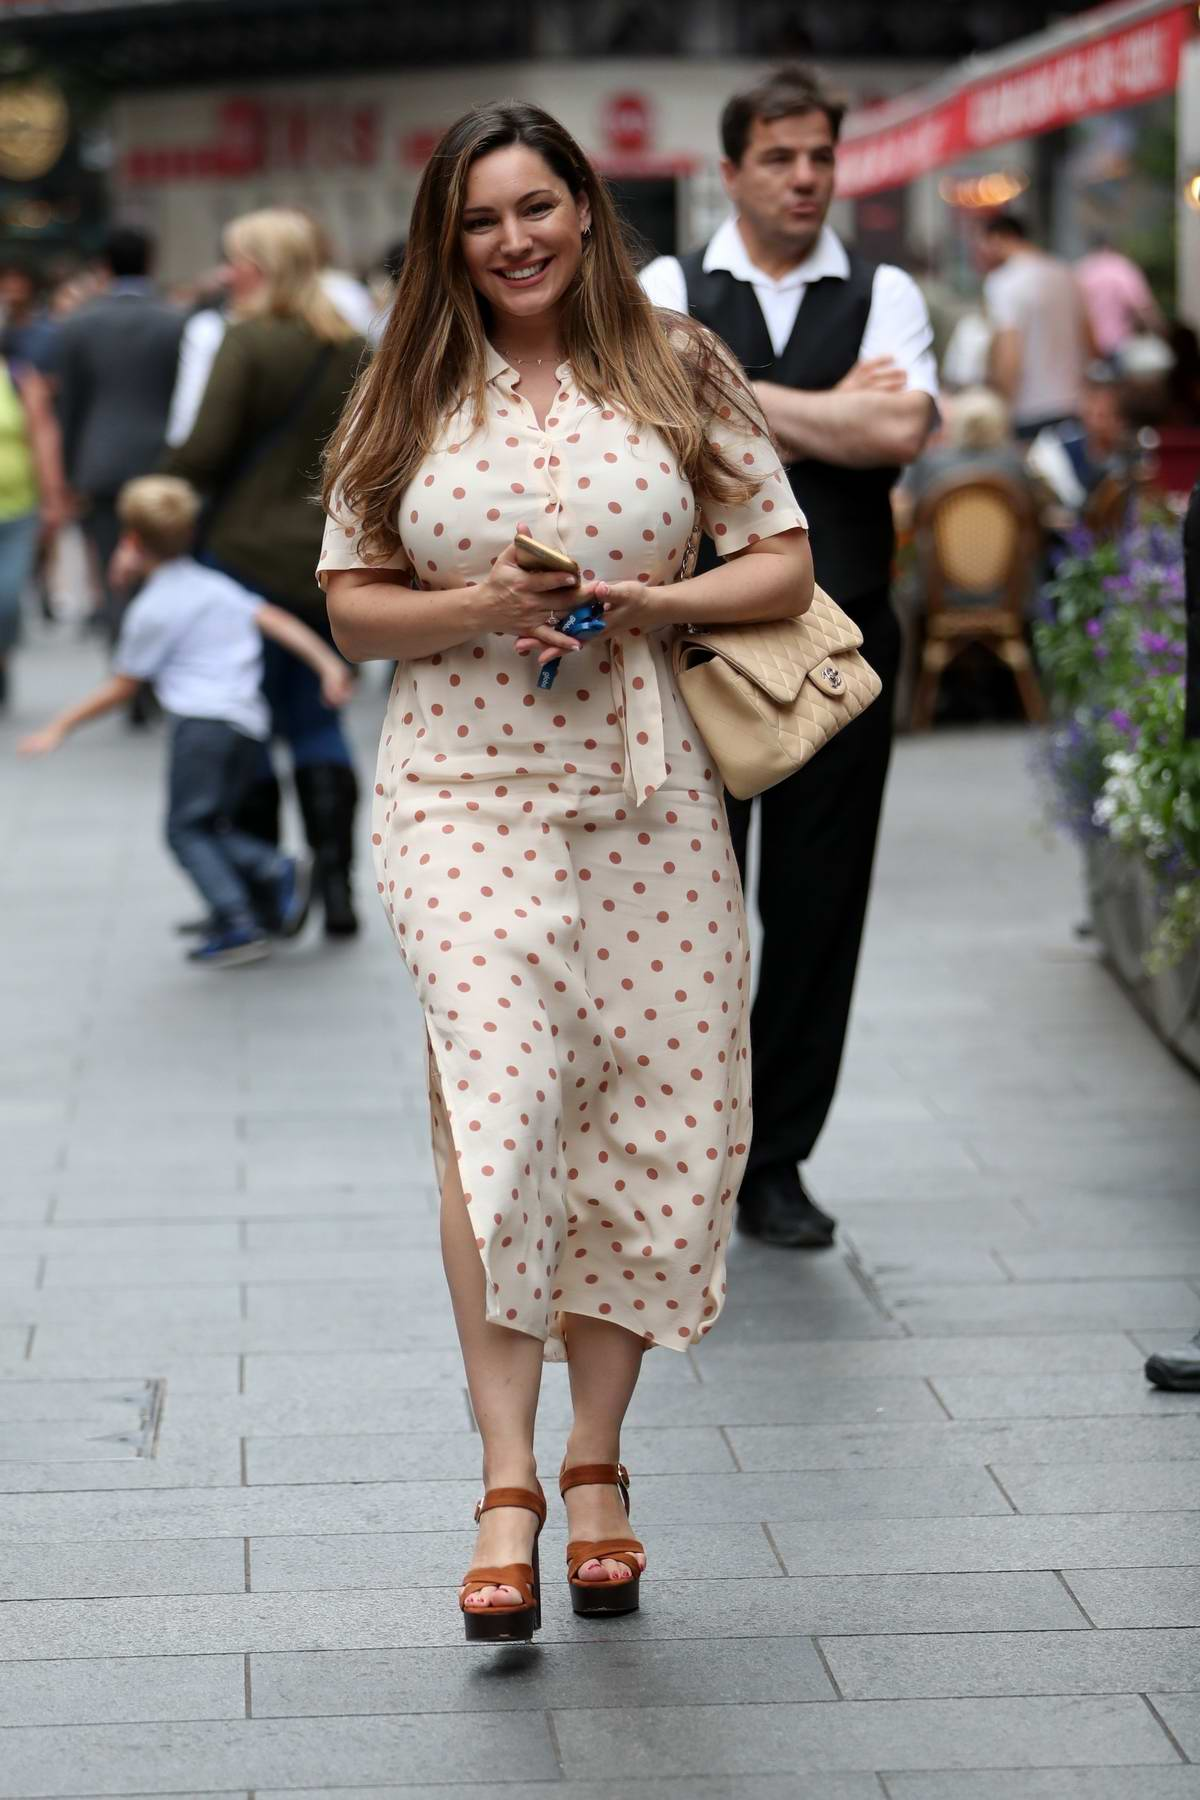 Kelly Brook looks adorable in a polka dot summer dress as she leaves Global Radio Studios in London, UK